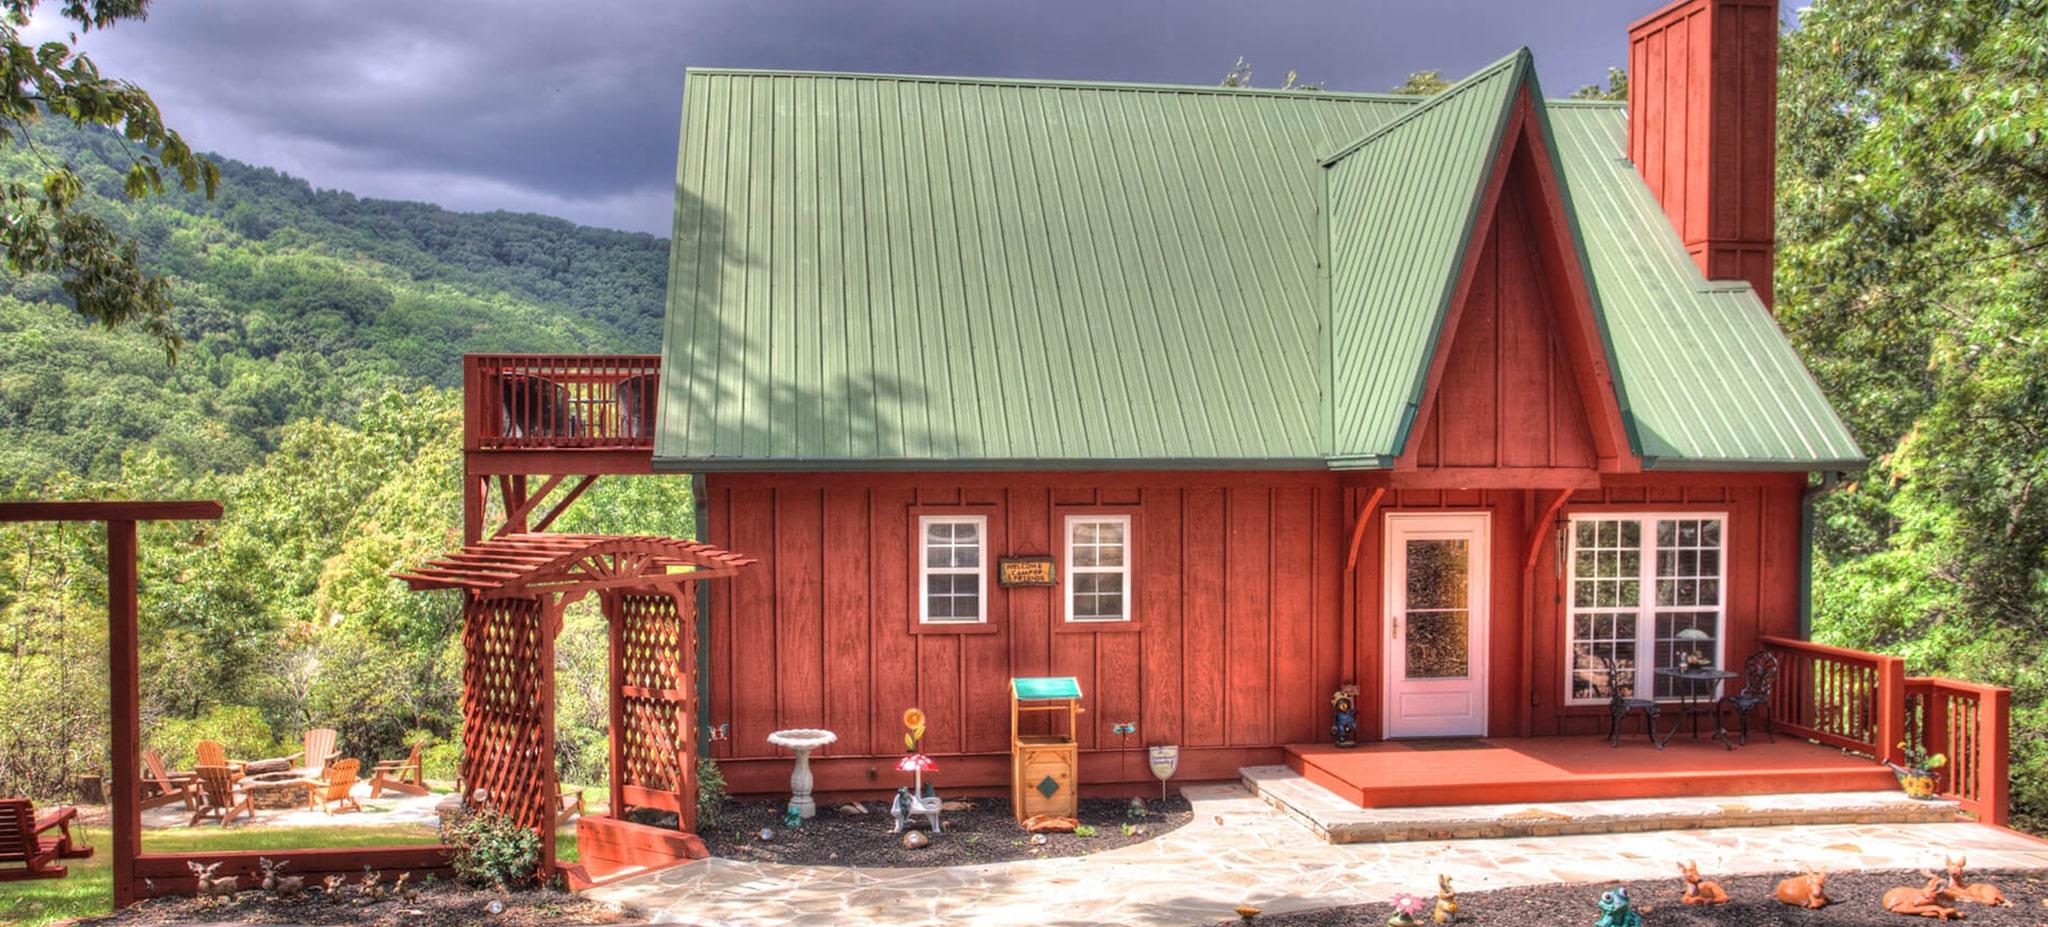 Gingerbread-Cedar-Creek-Cabin-Rentals-Helen-Georgia-home-Spring-banner